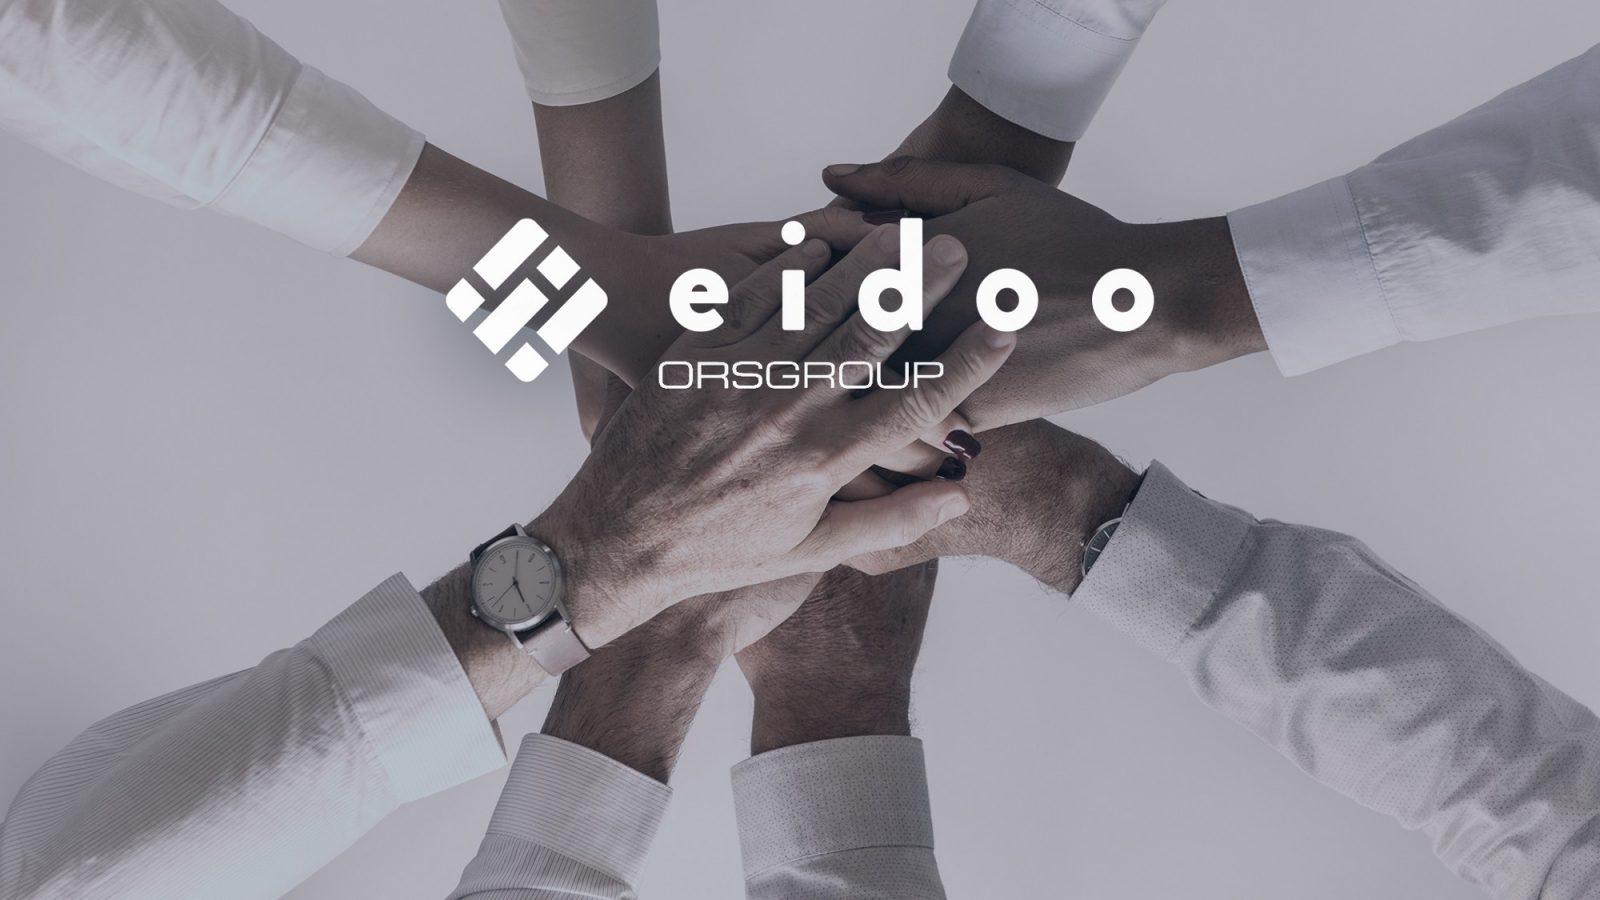 Il wallet Eidoo diventa hypersmart grazie agli algoritmi di ORS AI - Il wallet Eidoo diventa hypersmart grazie agli algoritmi di ORS AI